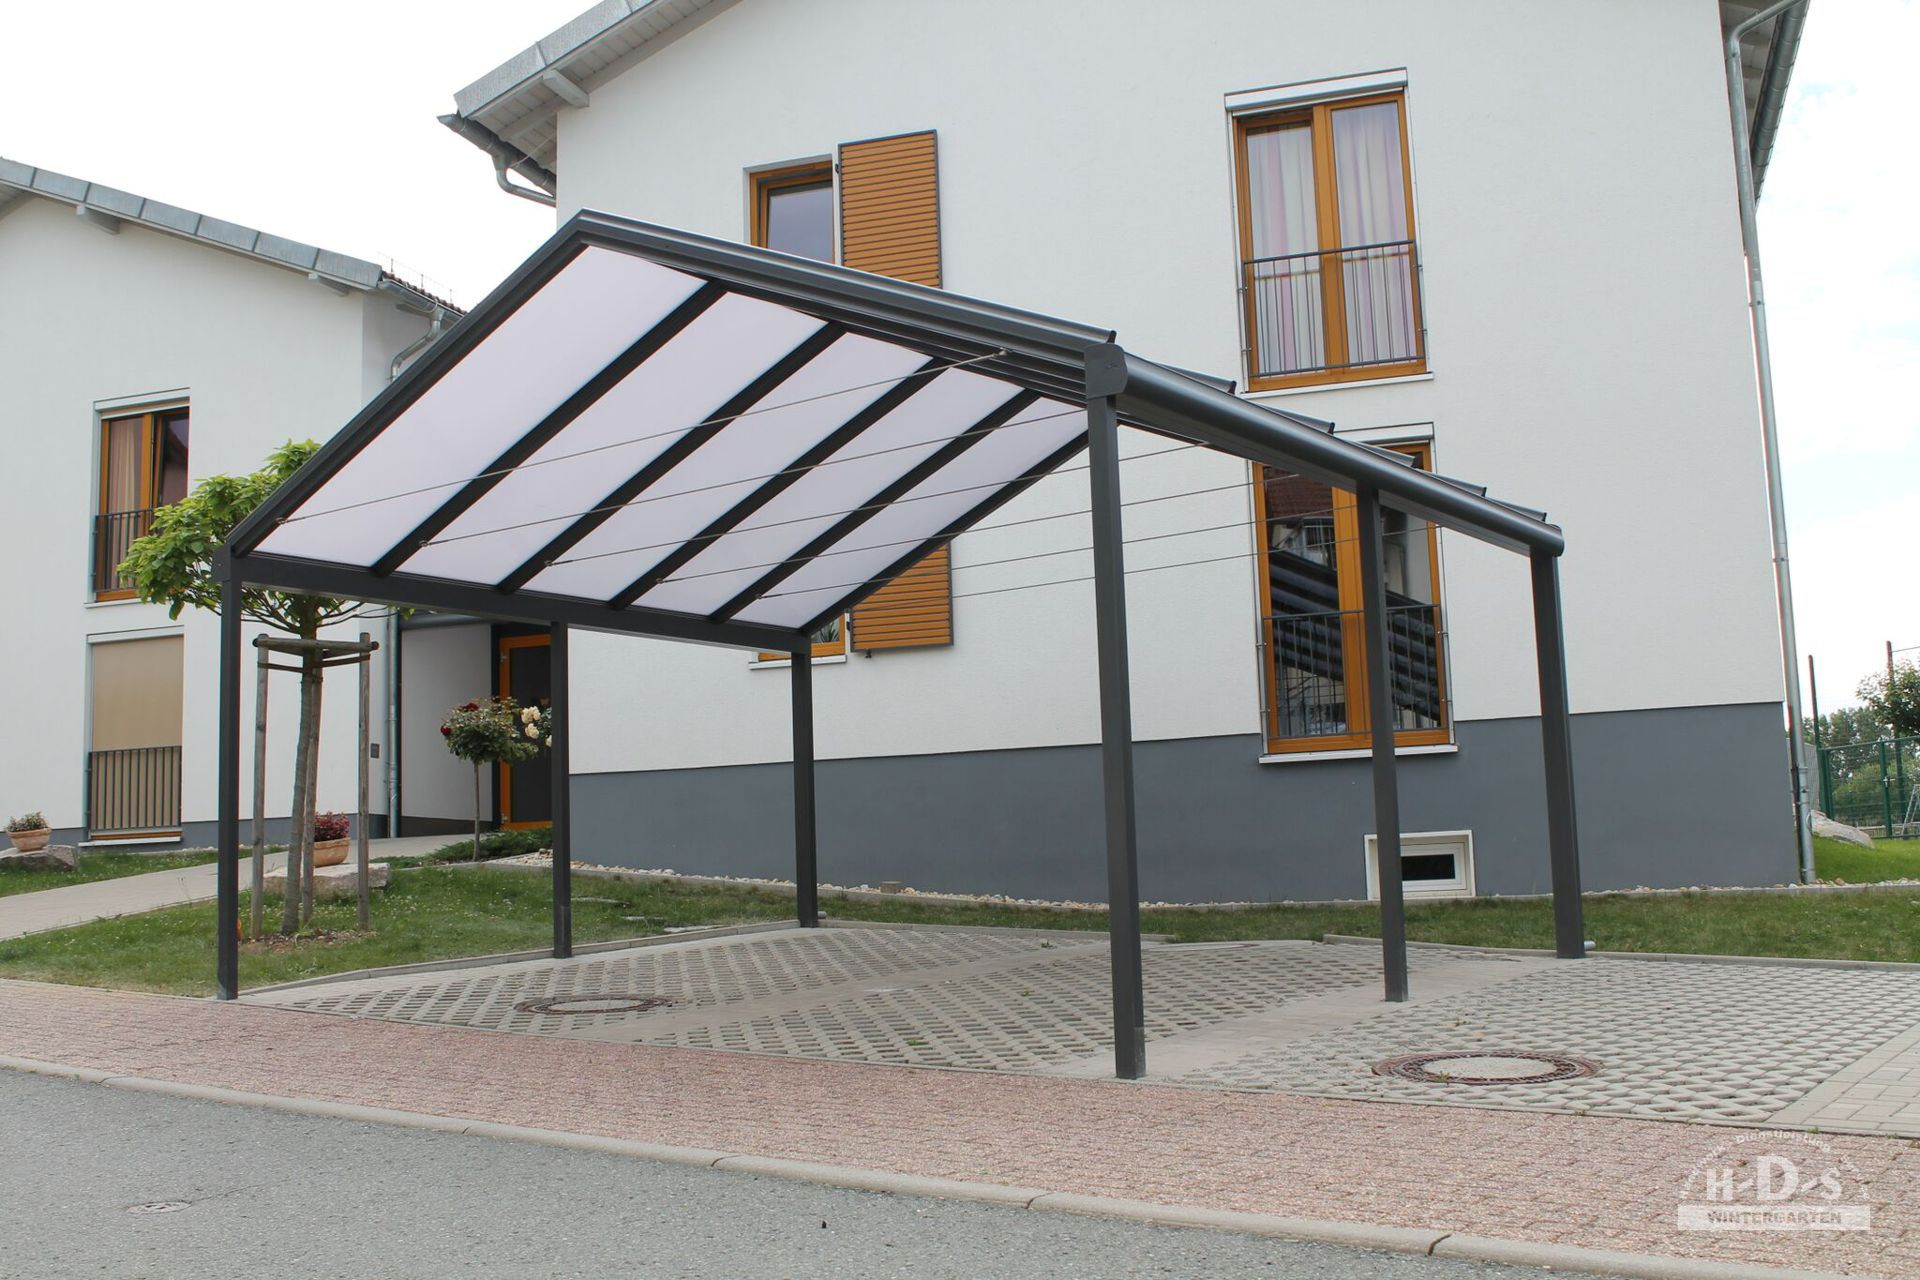 HDS - Carport